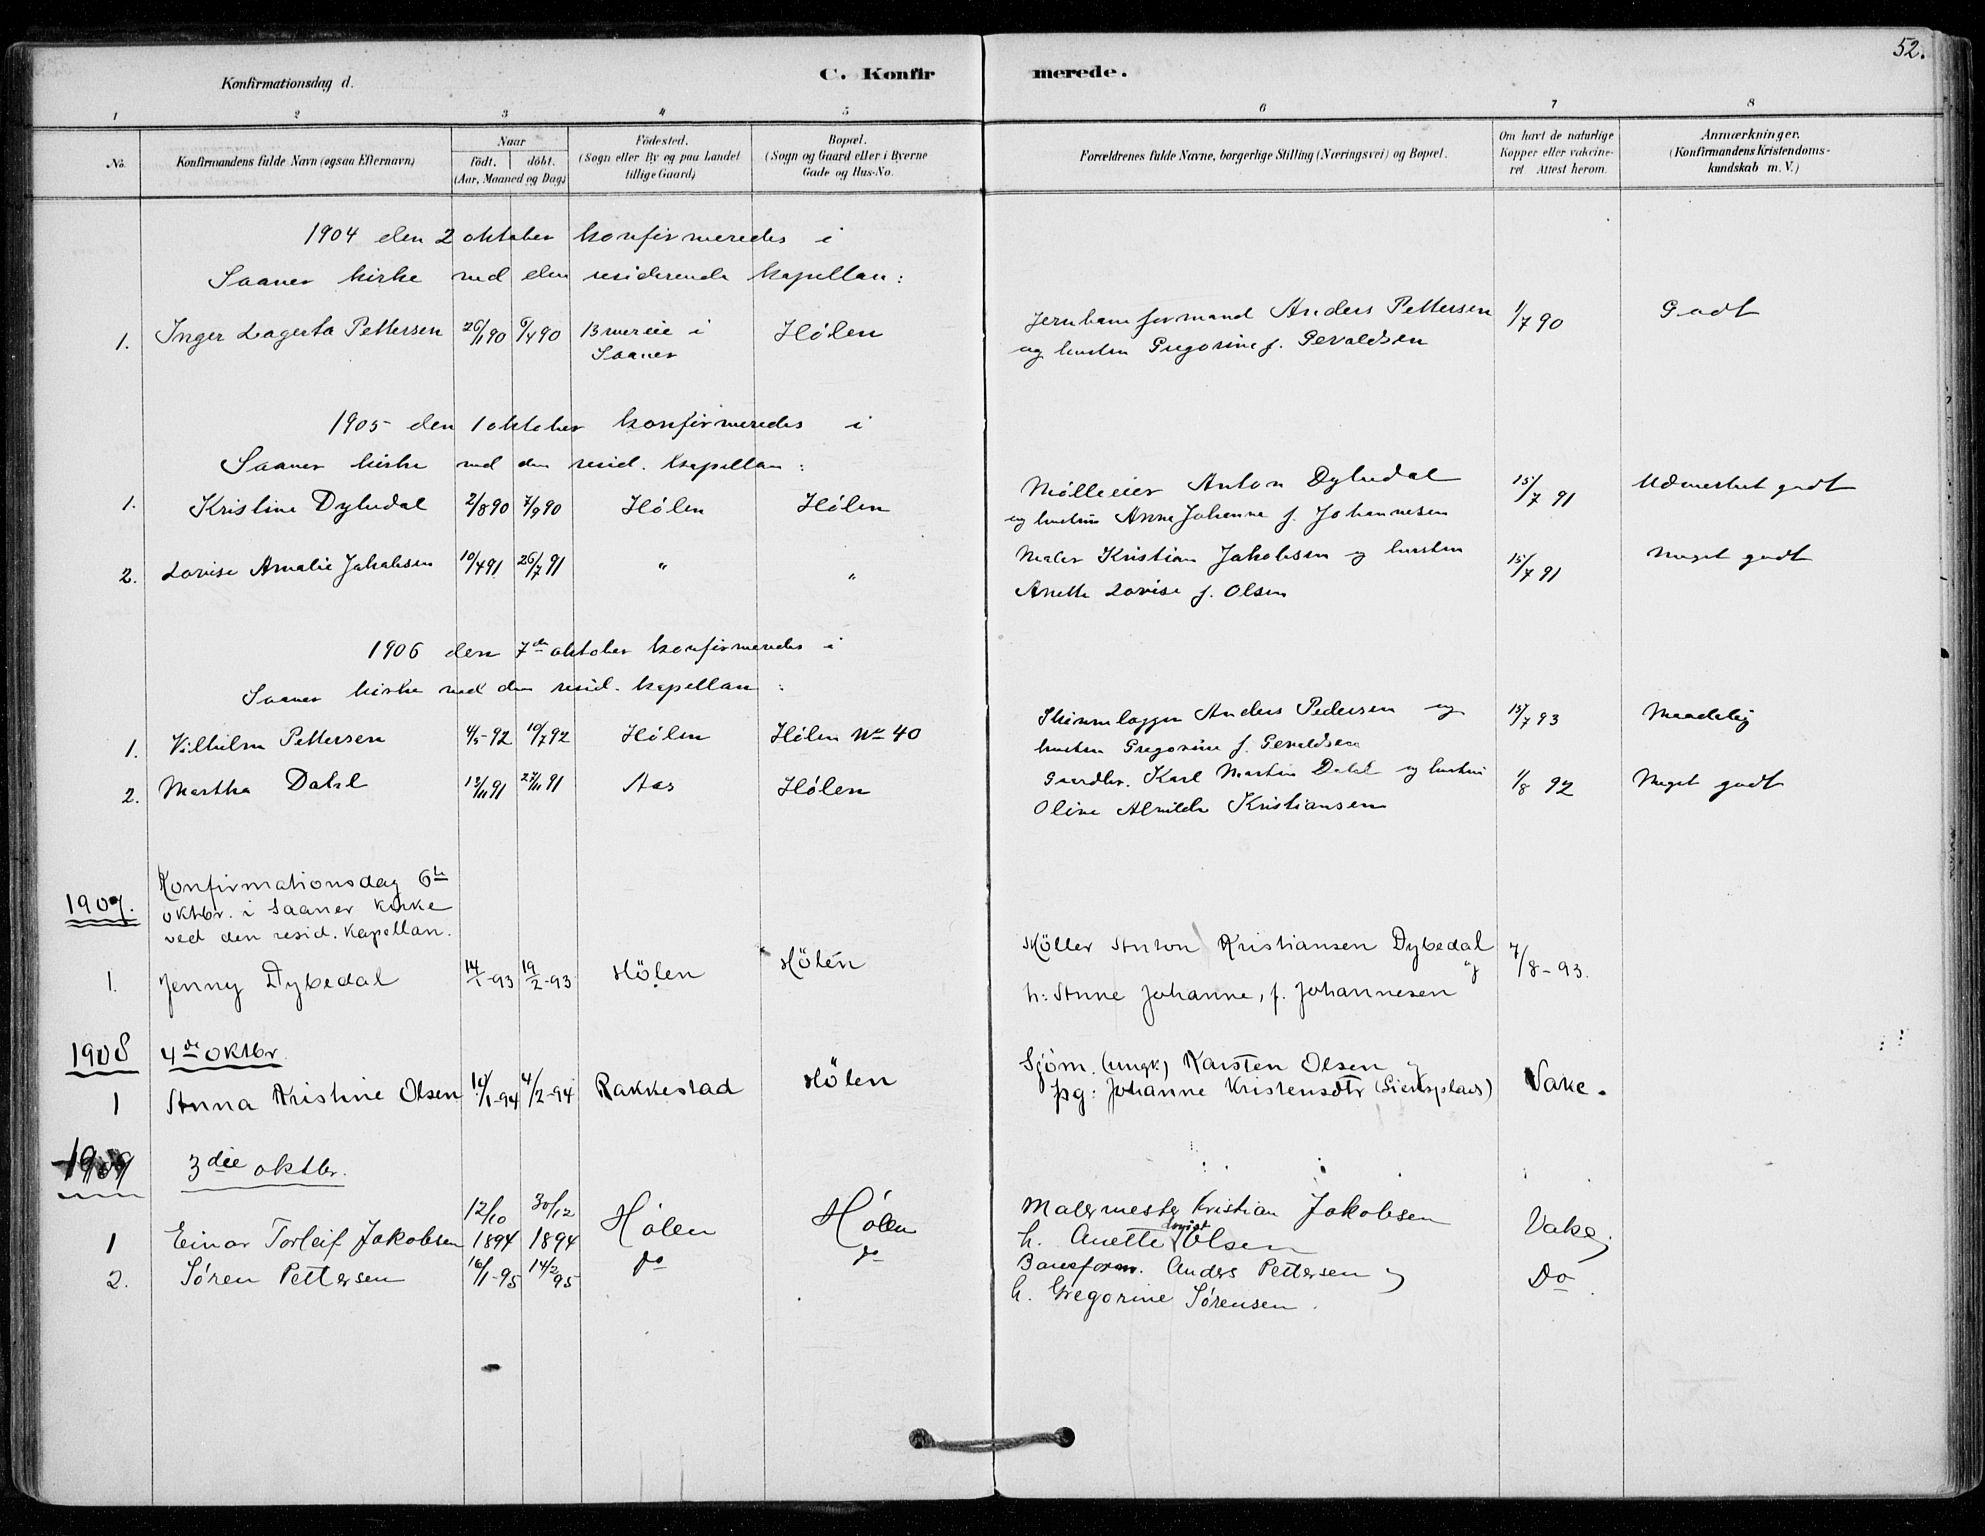 SAO, Vestby prestekontor Kirkebøker, F/Fe/L0001: Ministerialbok nr. V 1, 1878-1931, s. 52